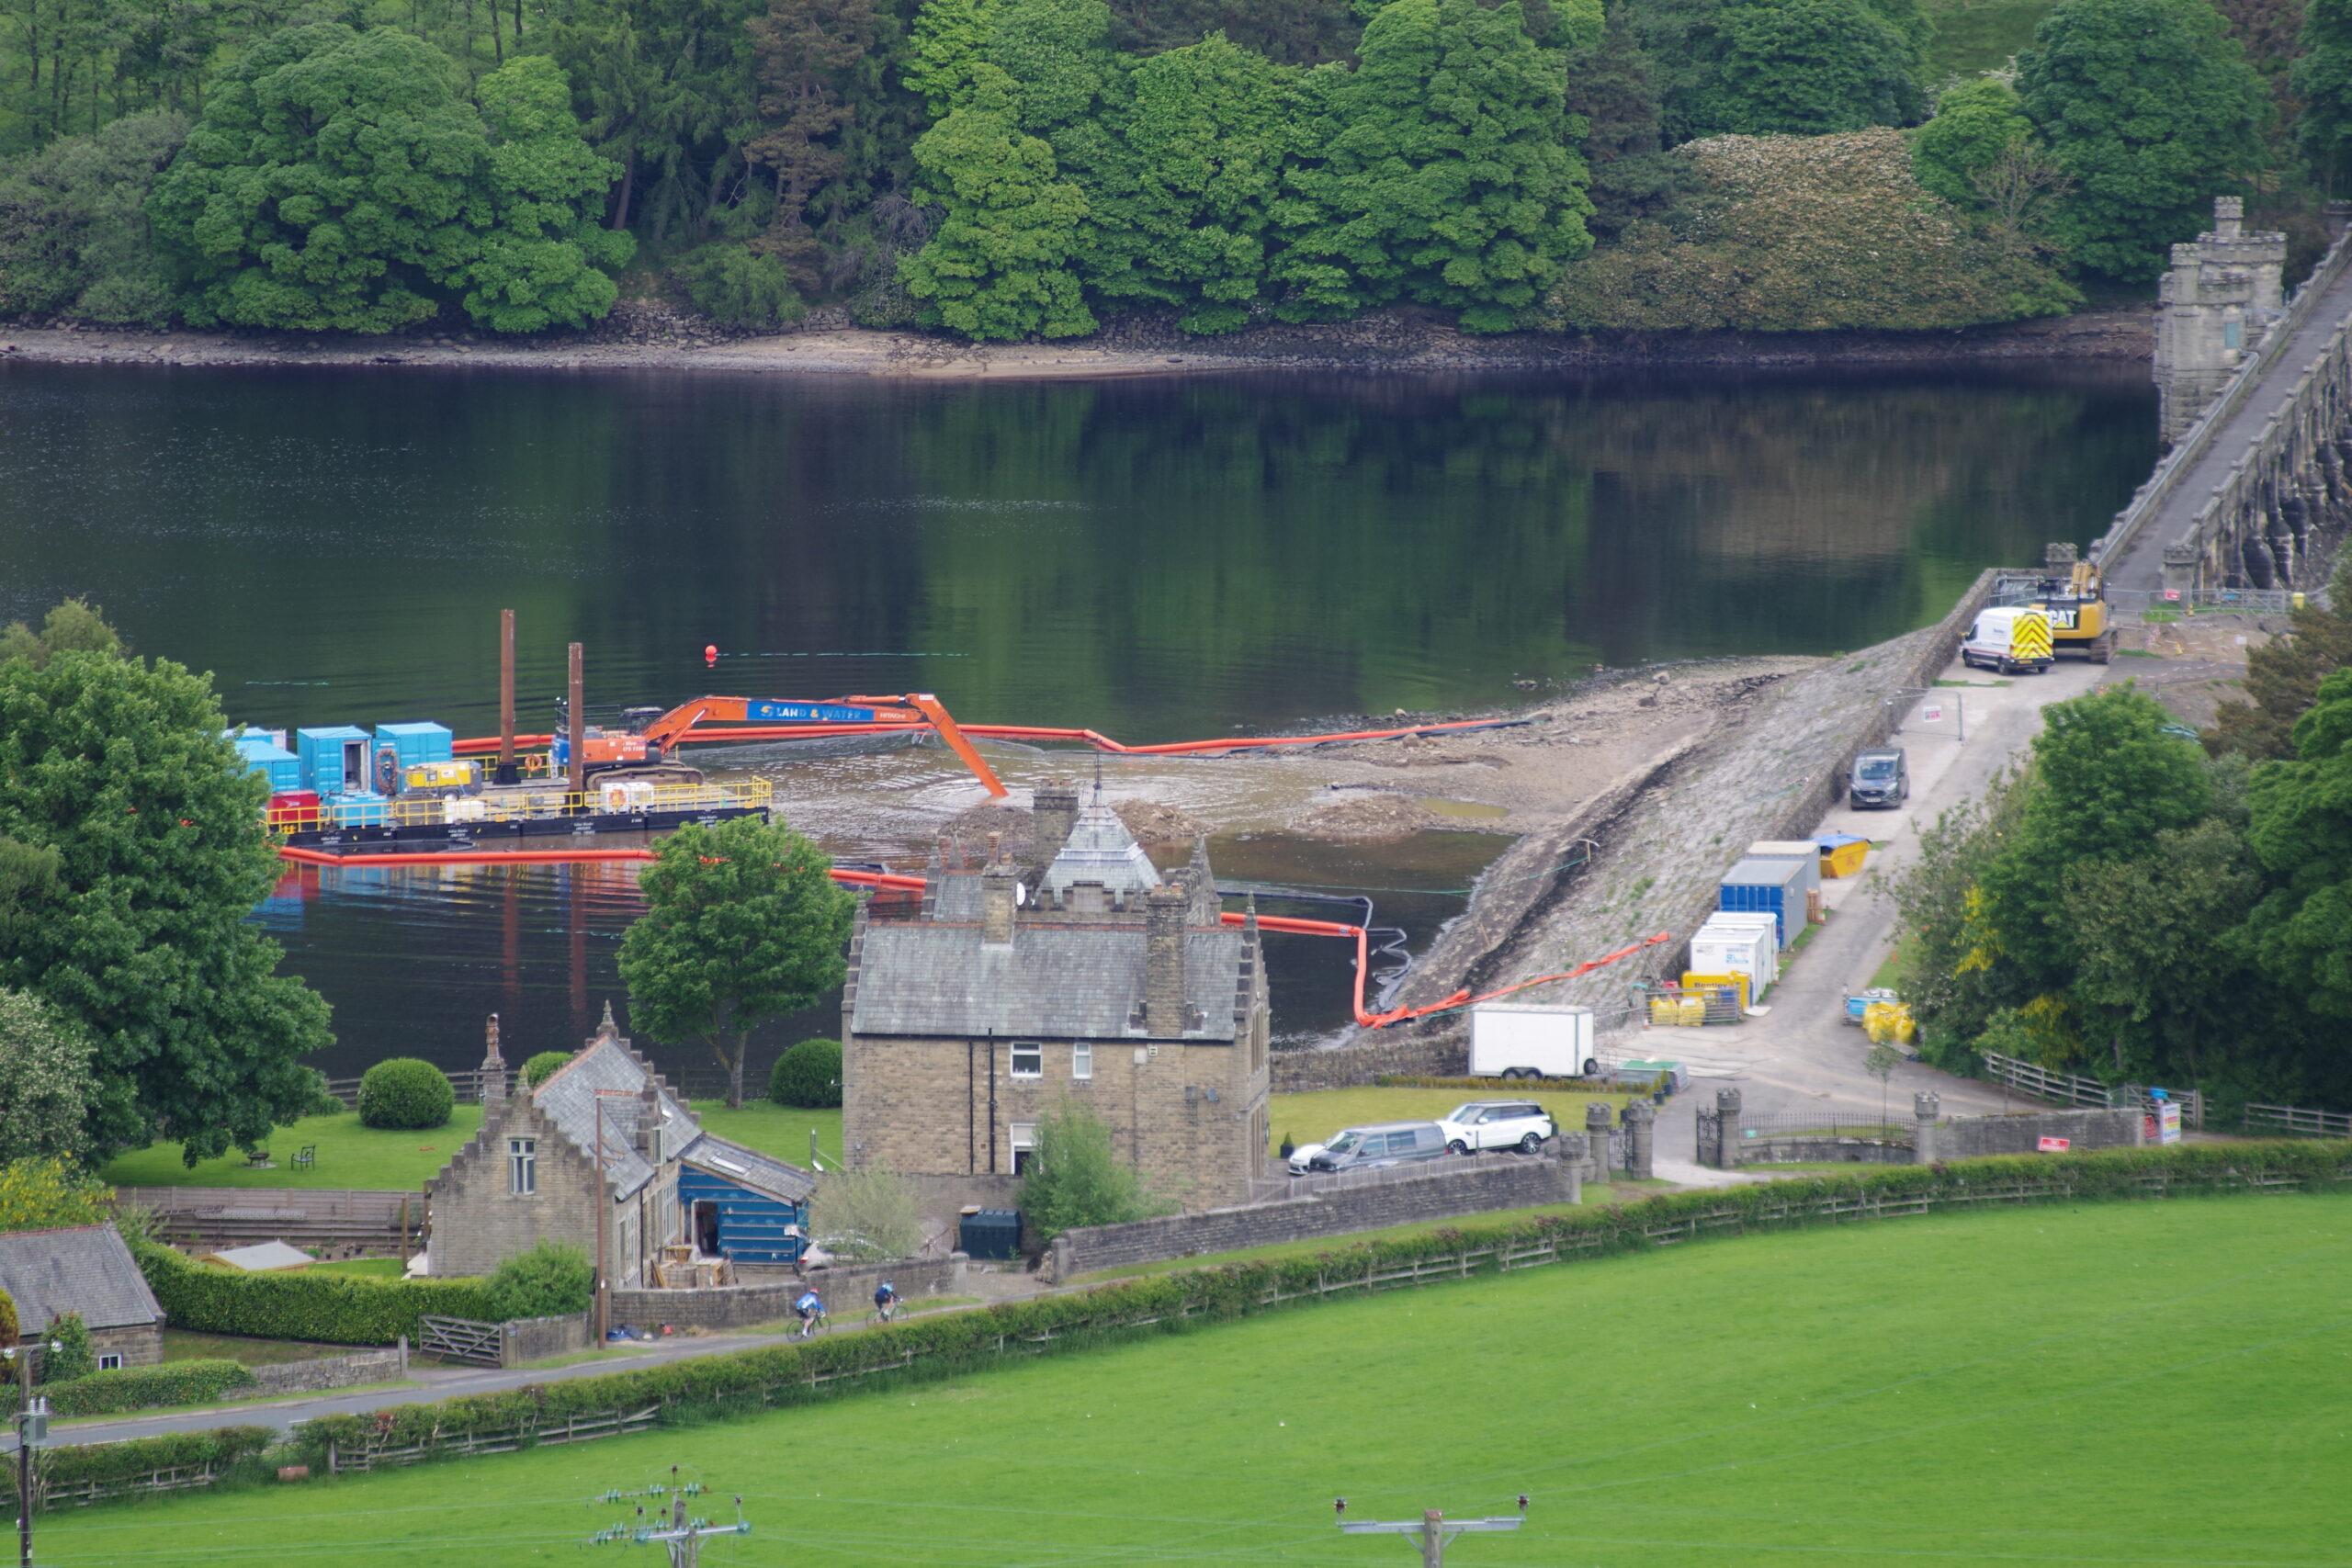 The work at Gouthwaite dam